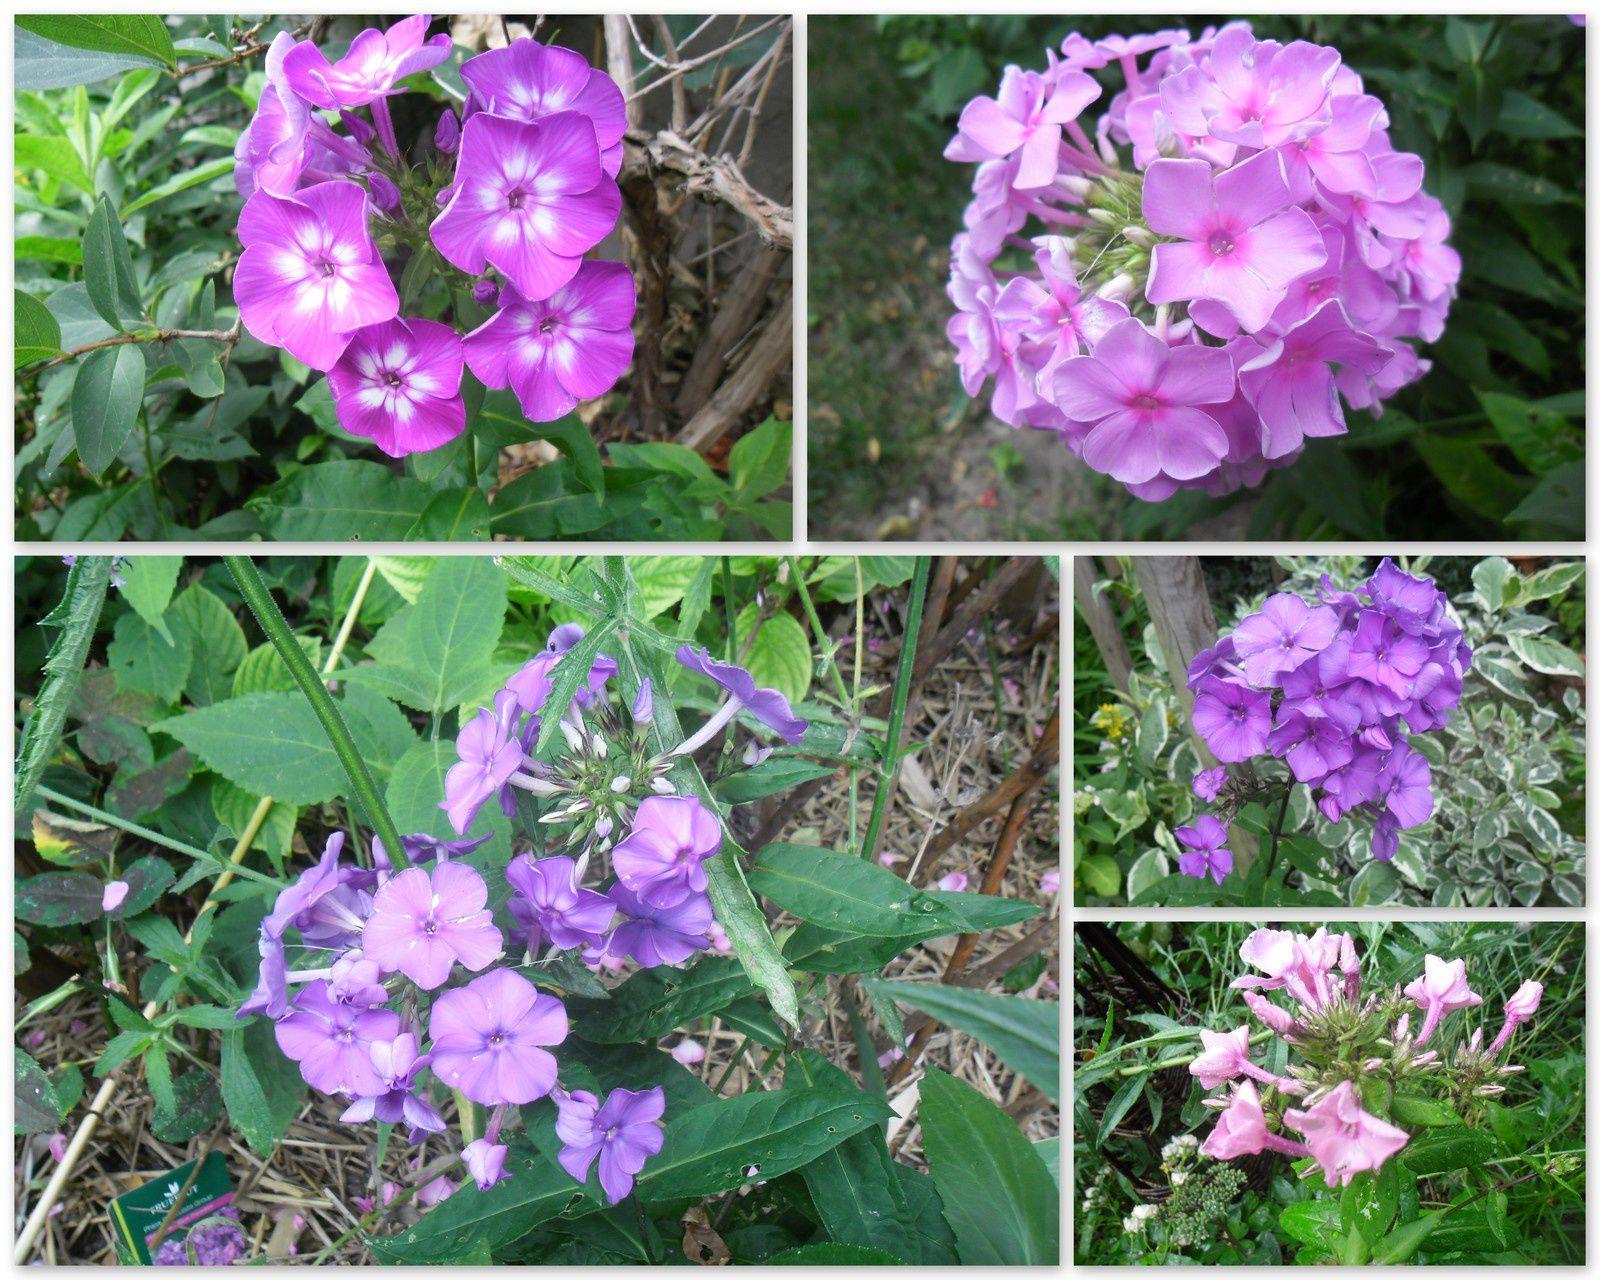 Phlox paniculata - photos empruntées à Jacqueline